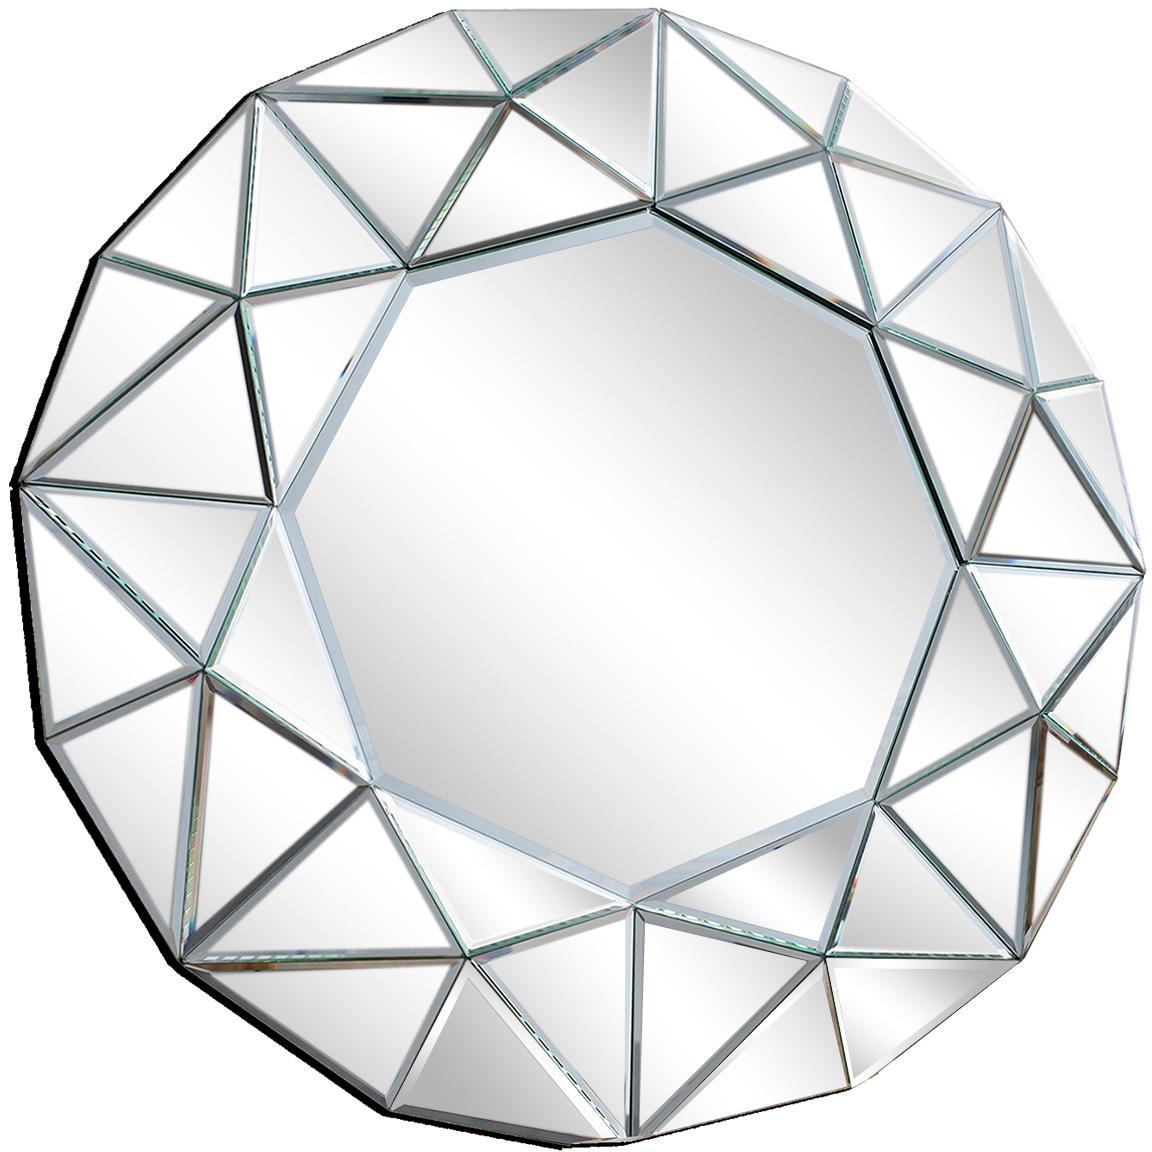 Espejo de pared Zaragoza, con marco de espejos, Reverso: tablero de fibras de dens, Espejo de cristal, Ø 70 x F 5 cm